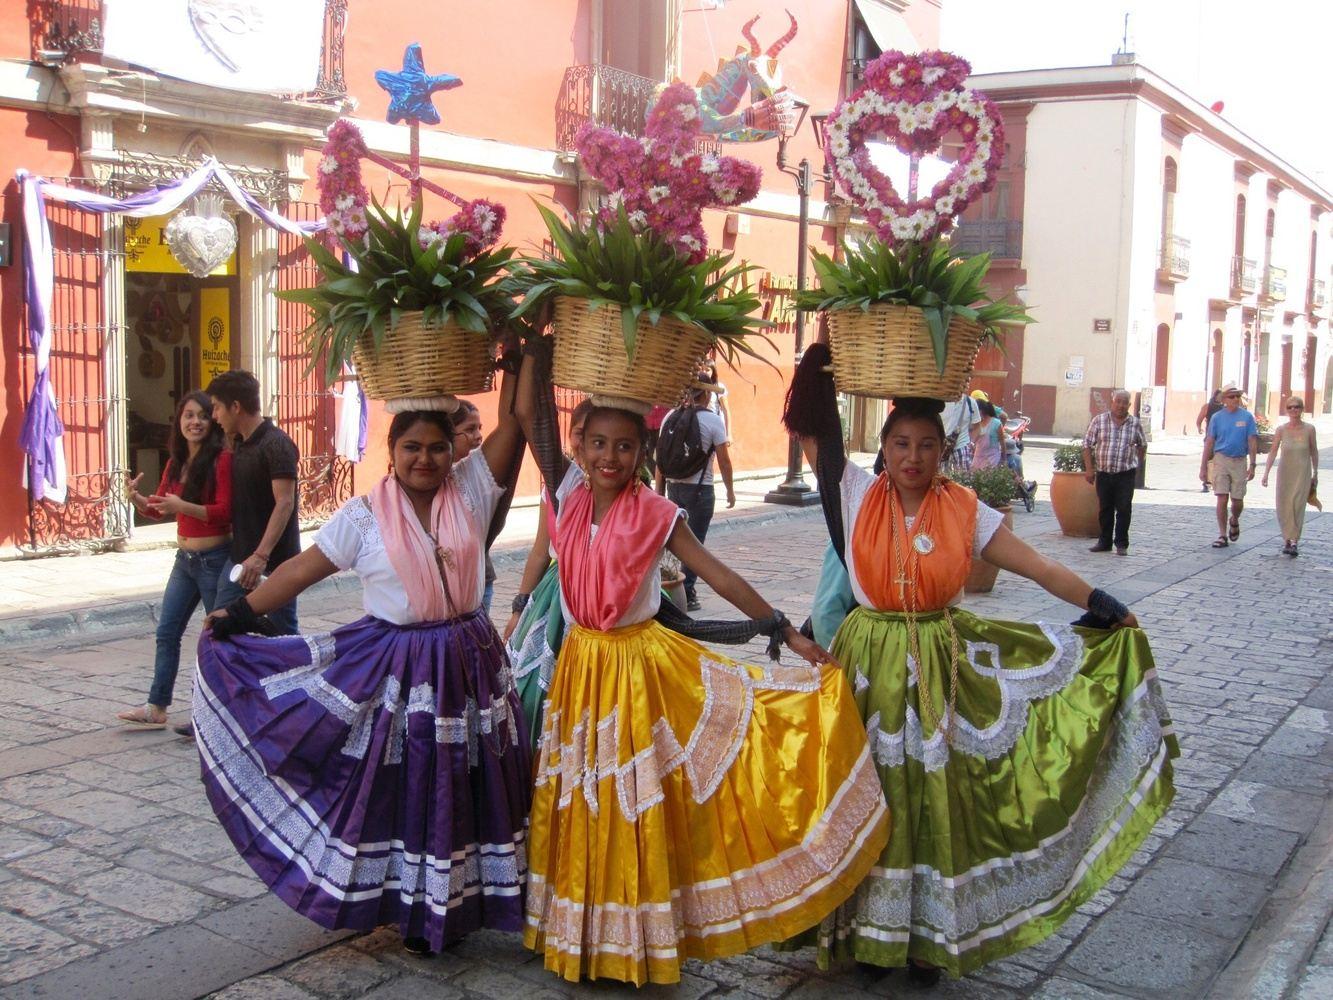 Celebrate & Create Art in Oaxaca w/ Mija Matriz